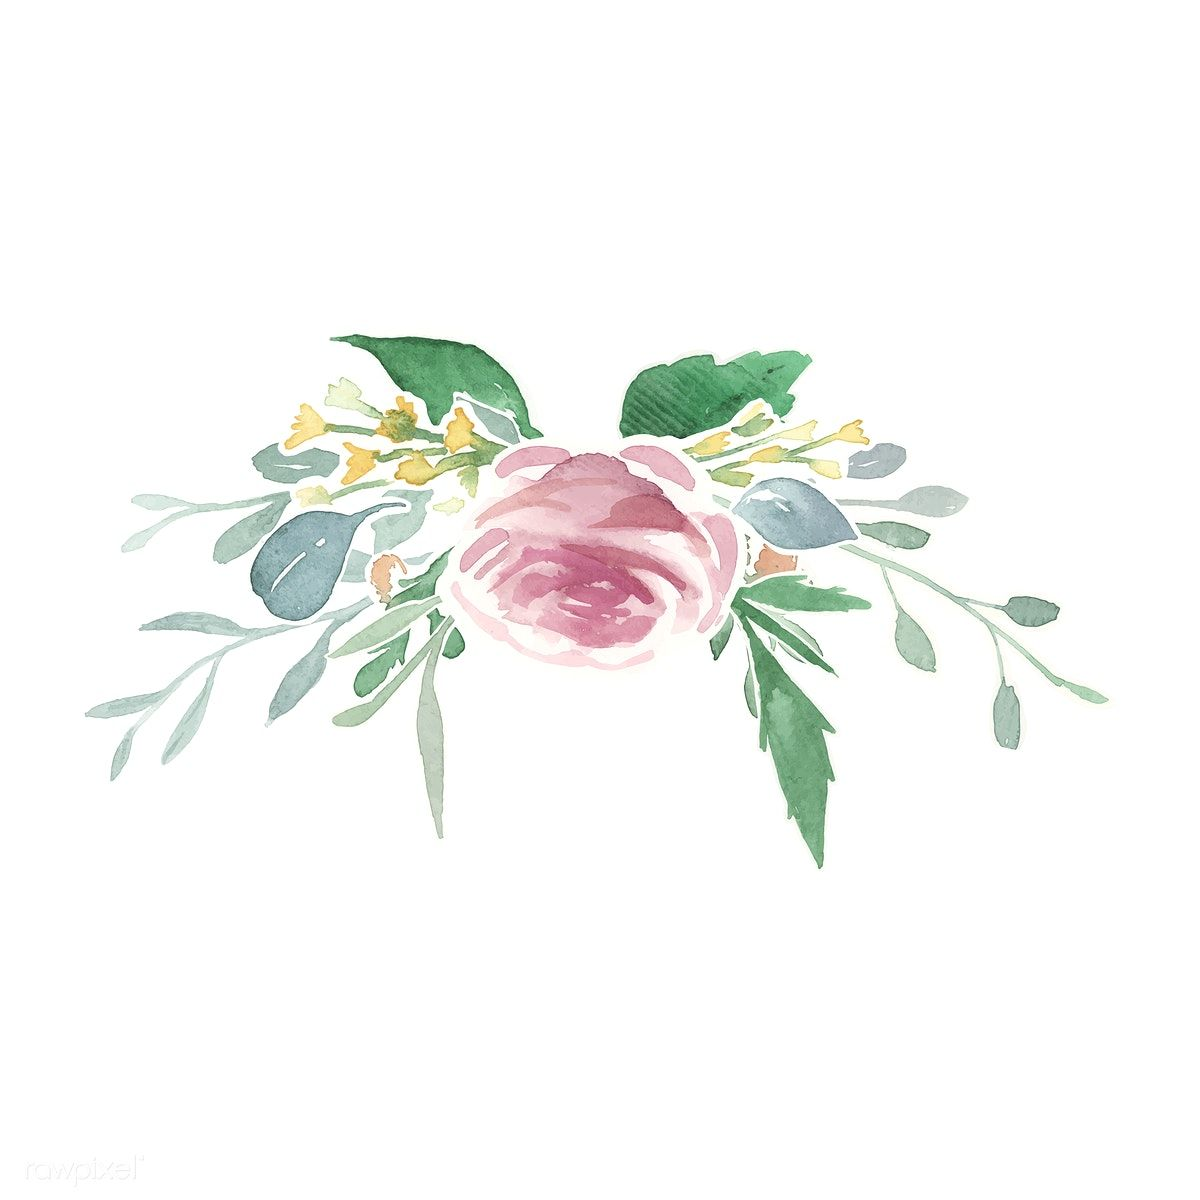 Vintage Floral Ornaments Free Image By Rawpixel Com Flower Illustration Vintage Floral Backgrounds Floral Watercolor